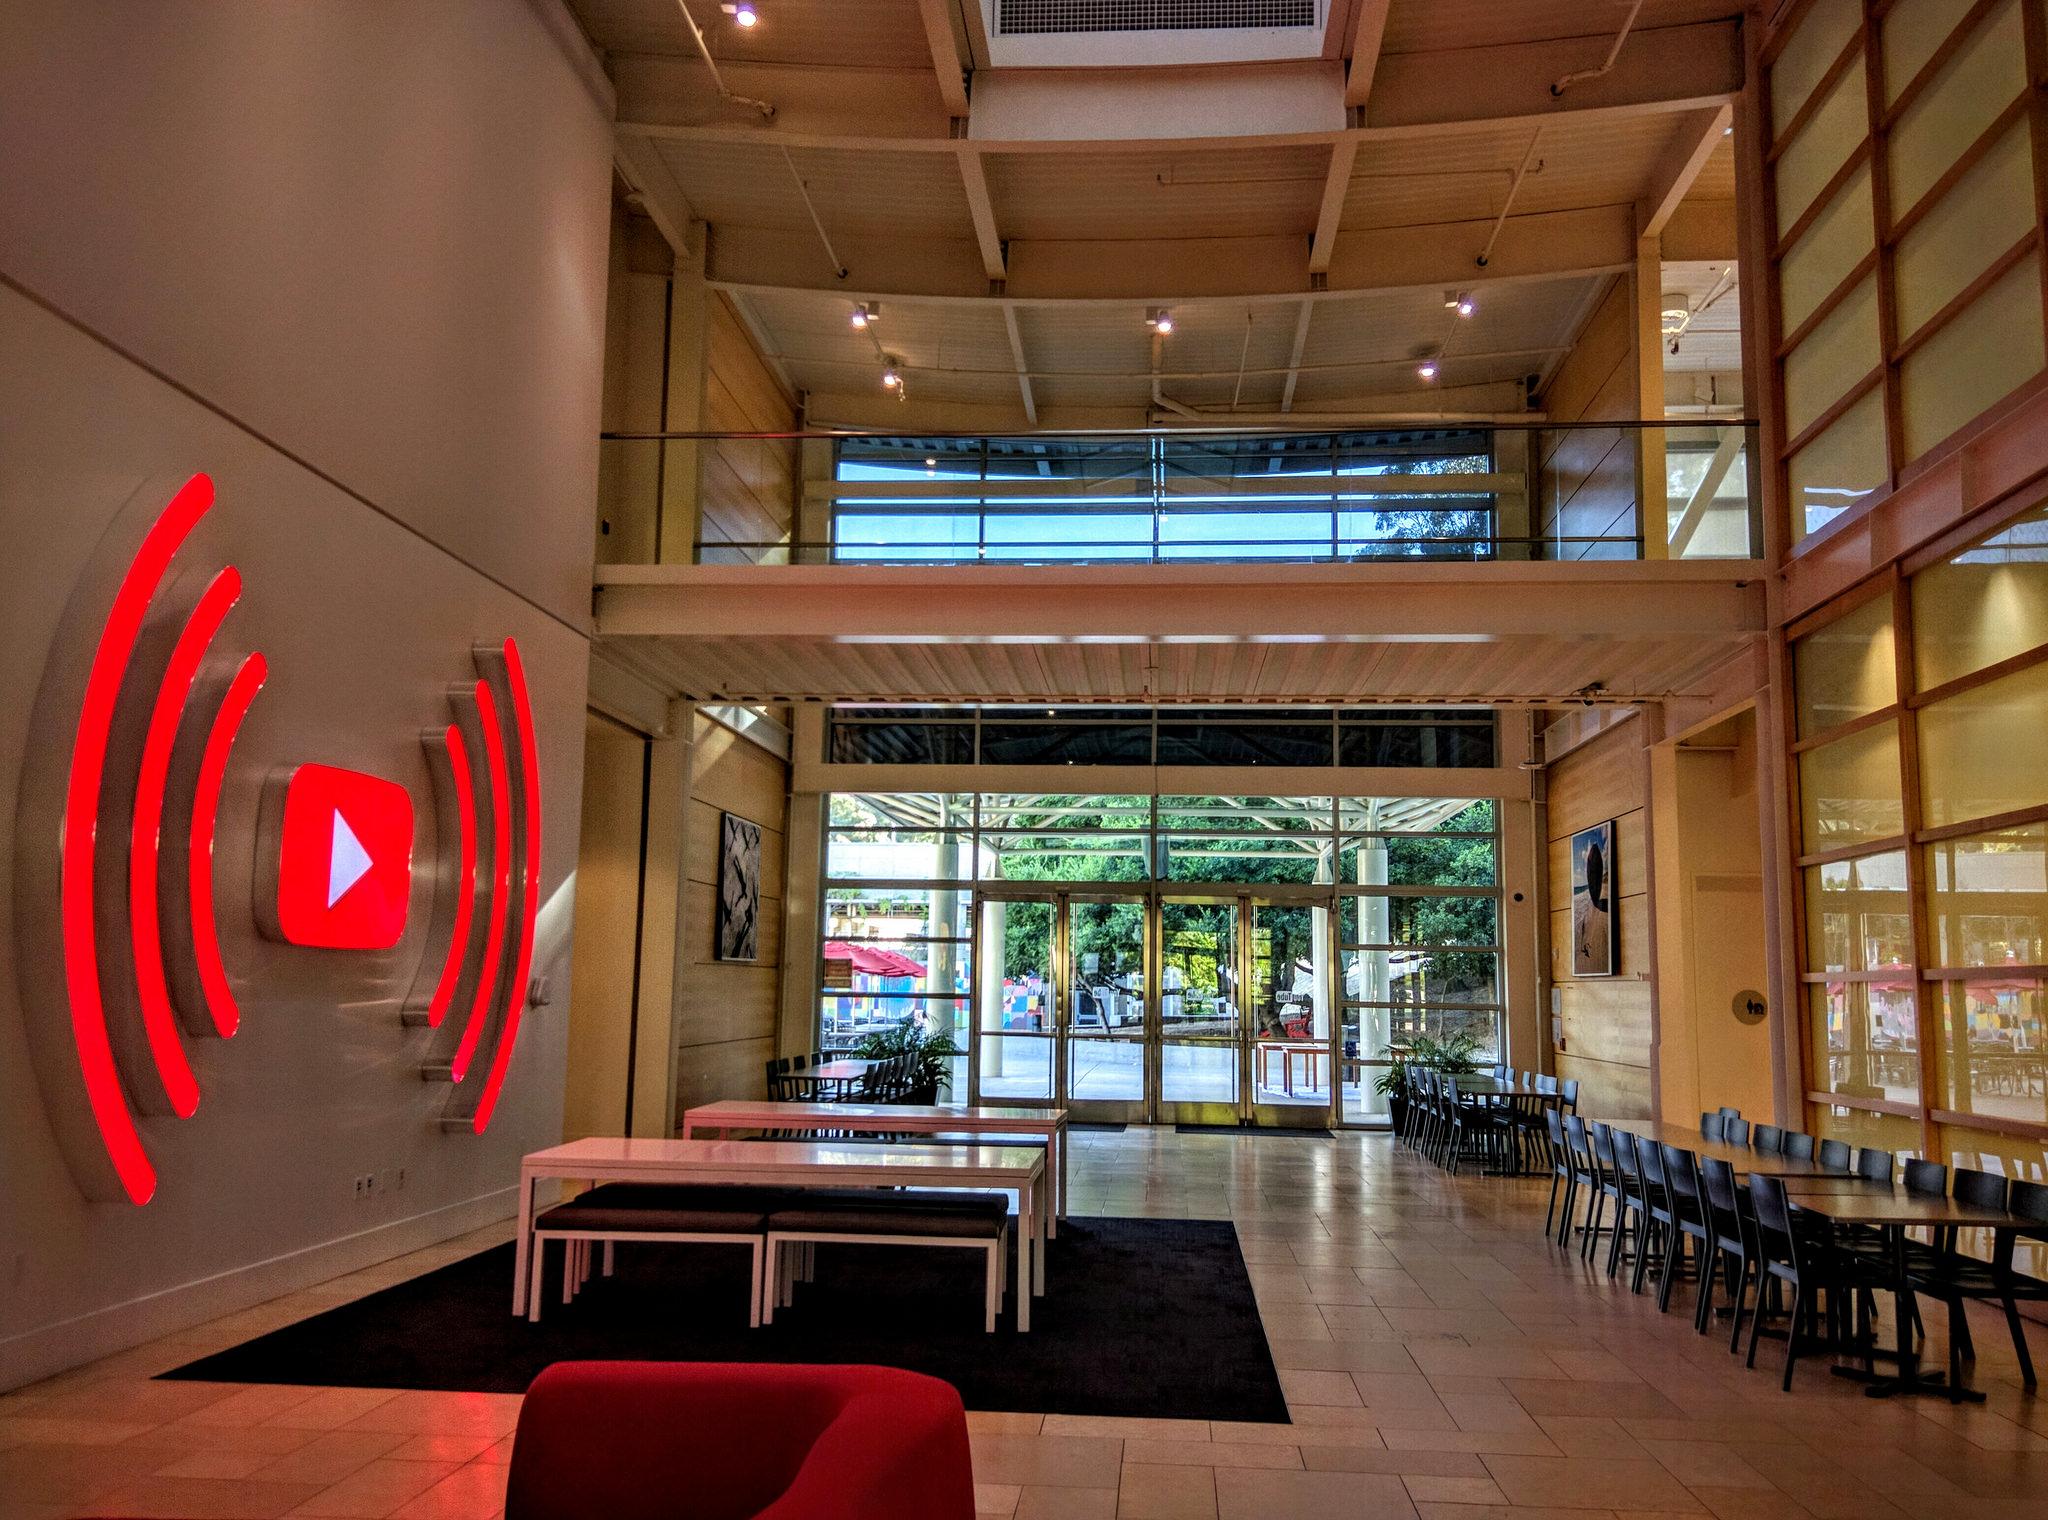 Youtube office in San Bruno